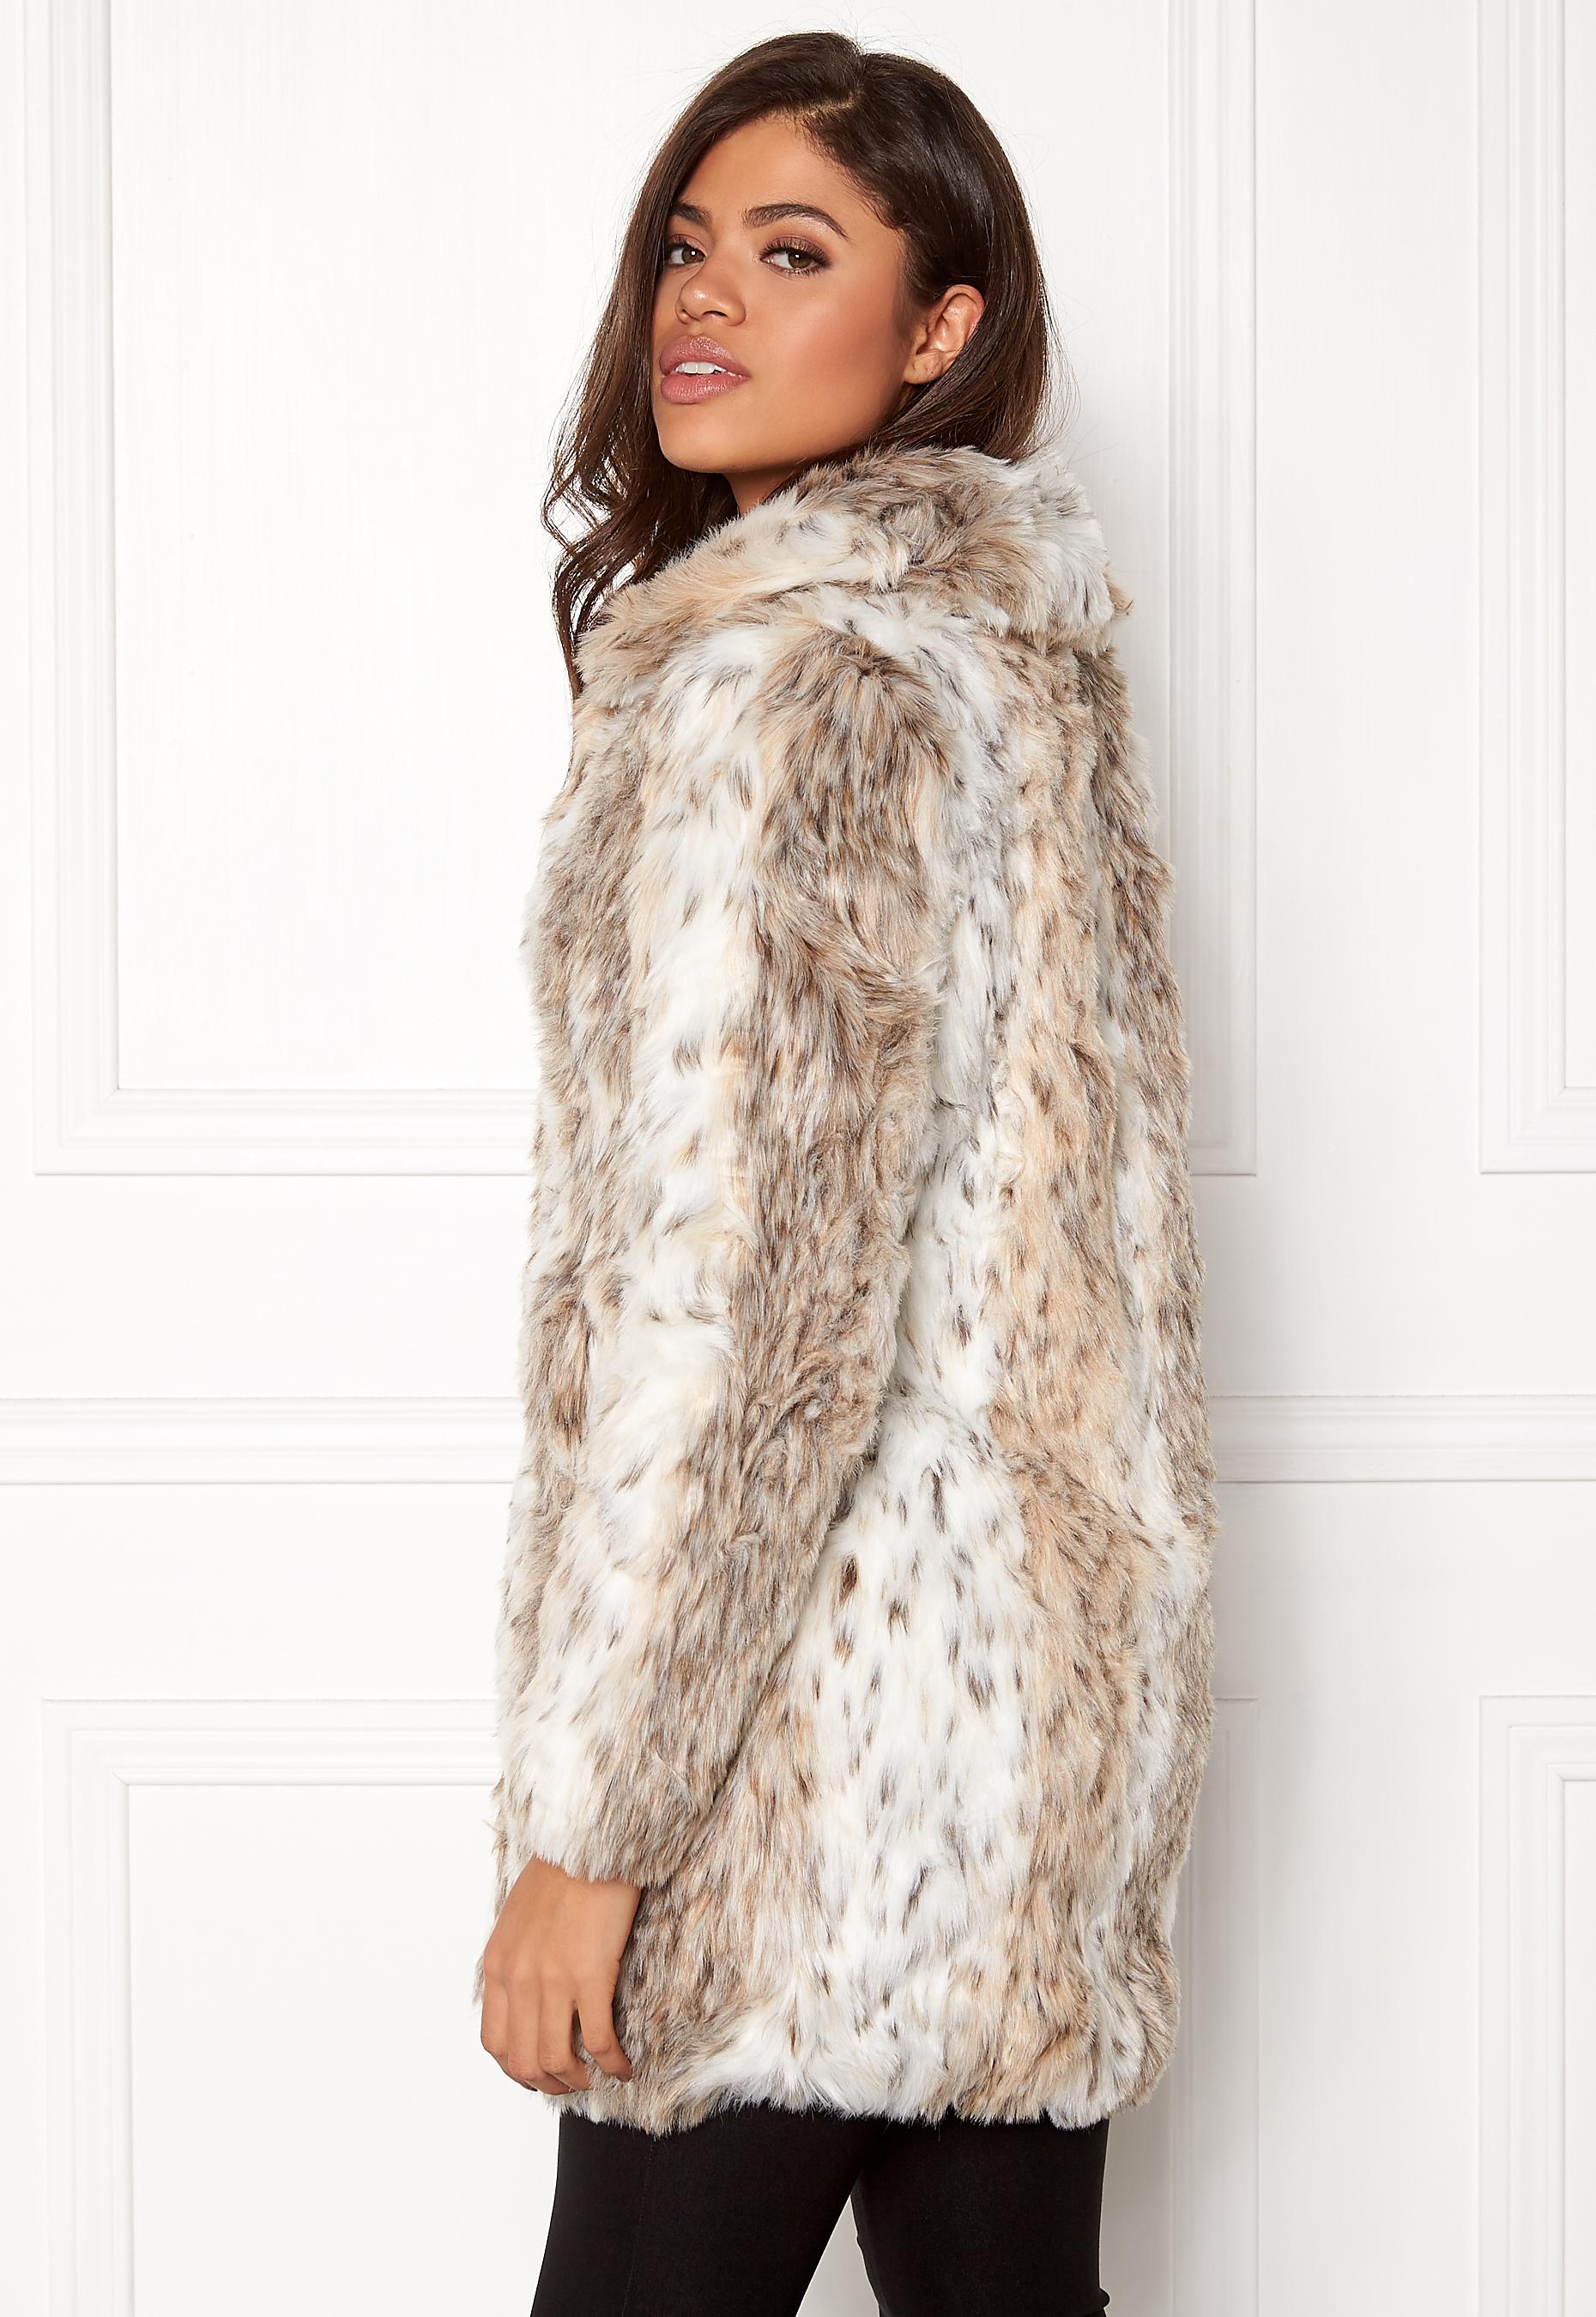 a03462ae83aa7 QED London Leopard Faux Fur Coat Snow Leopard - Bubbleroom